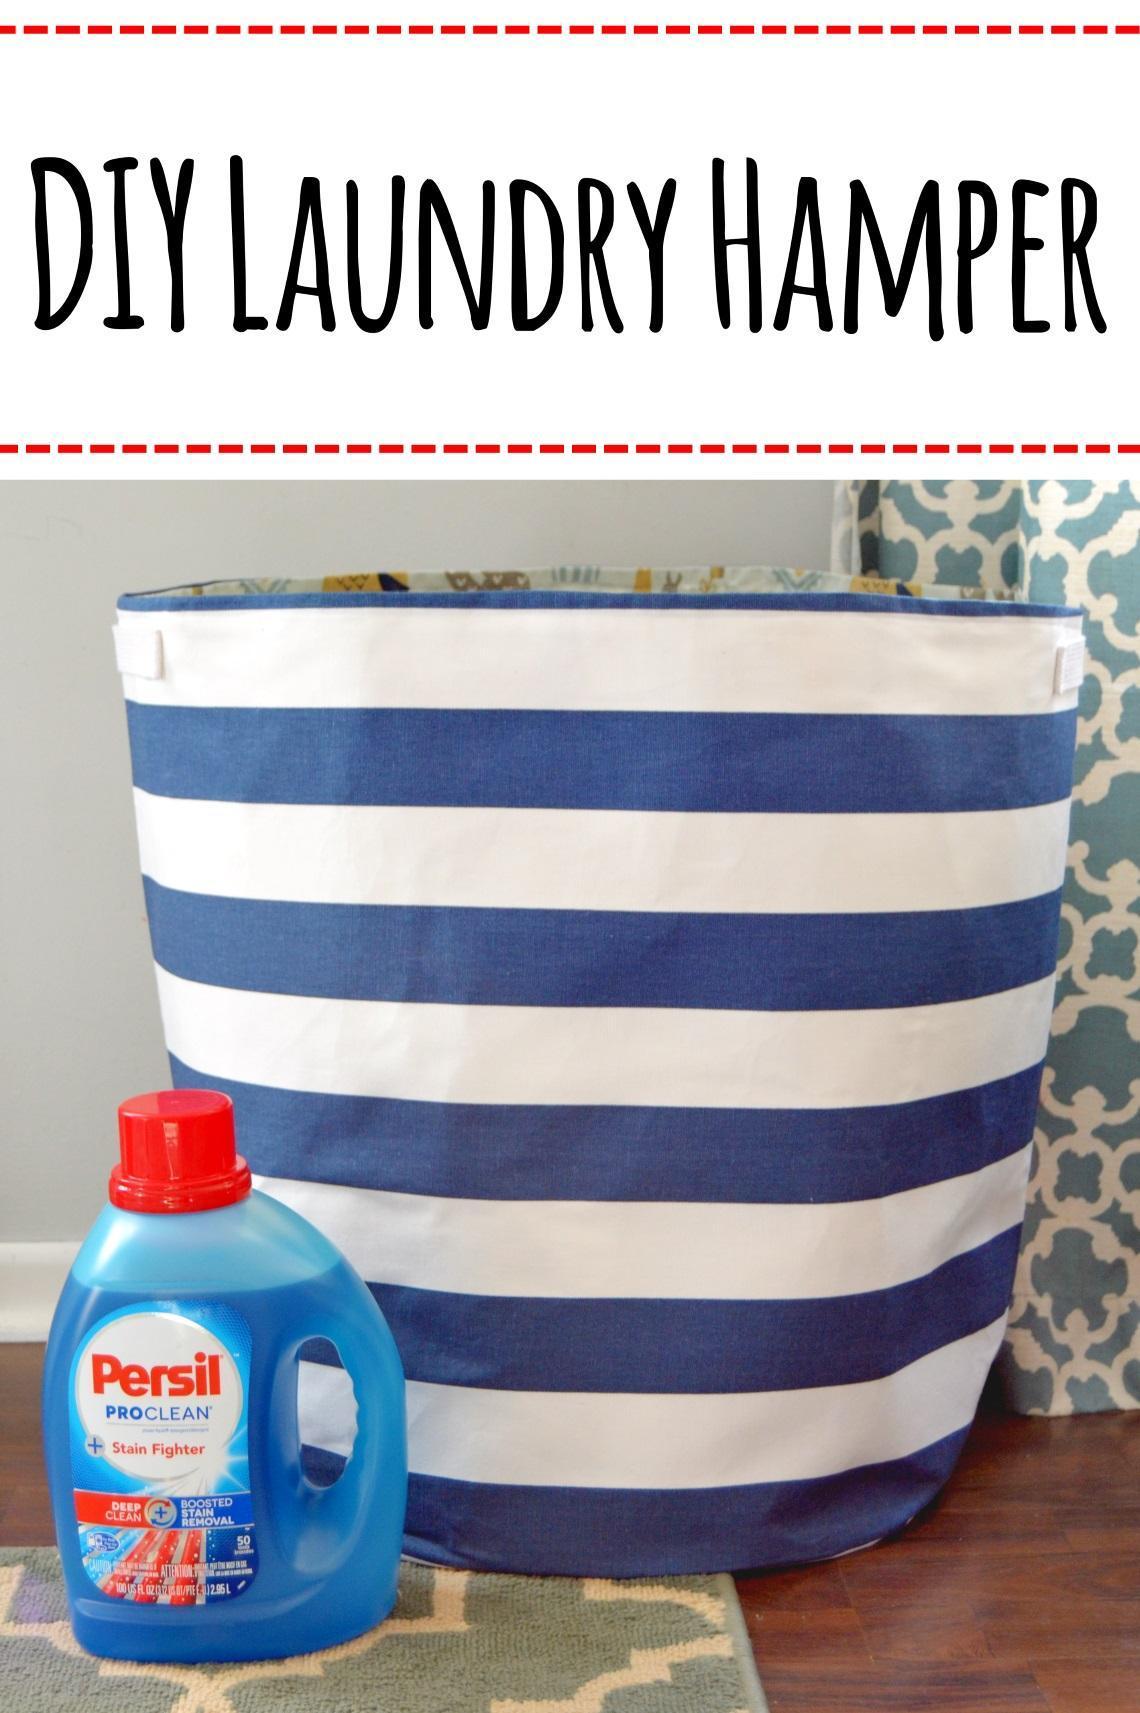 2. DIY Laundry Hamper